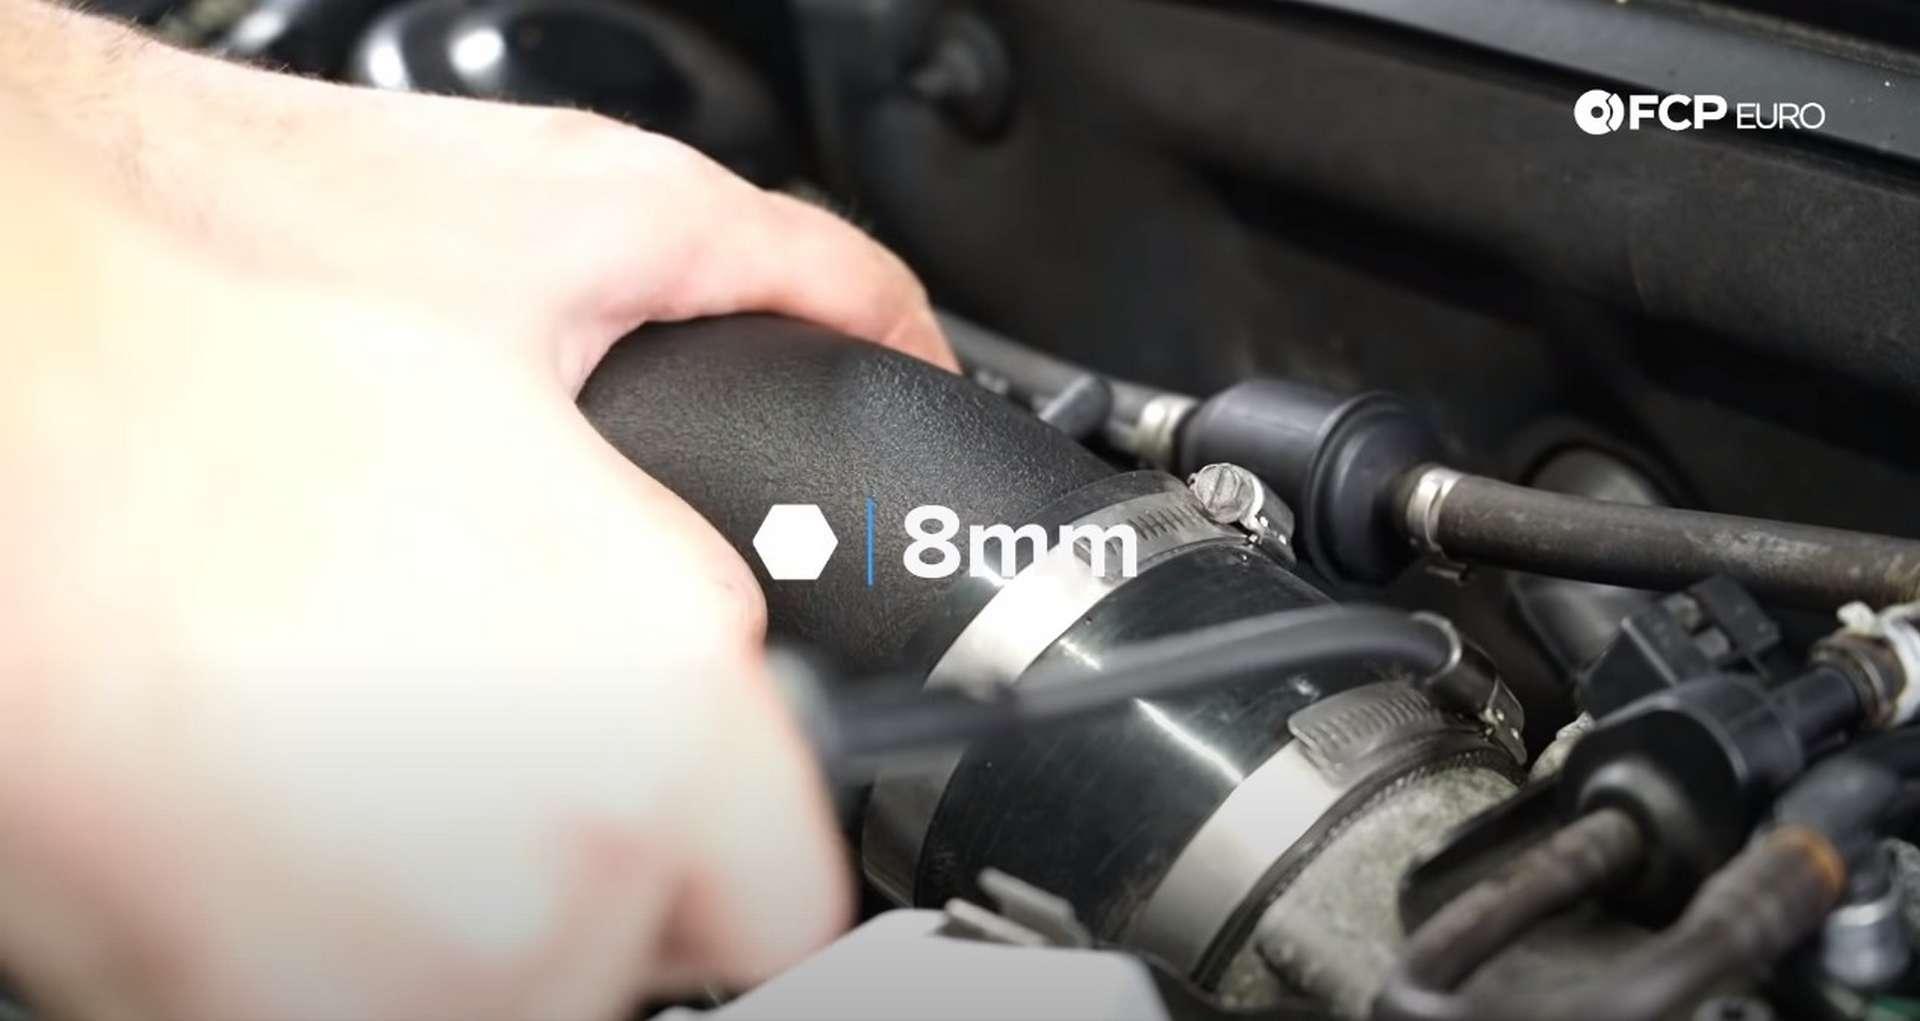 DIY Audi 3.0t Walnut Blasting Intake Valves tightening the intake hose clamps